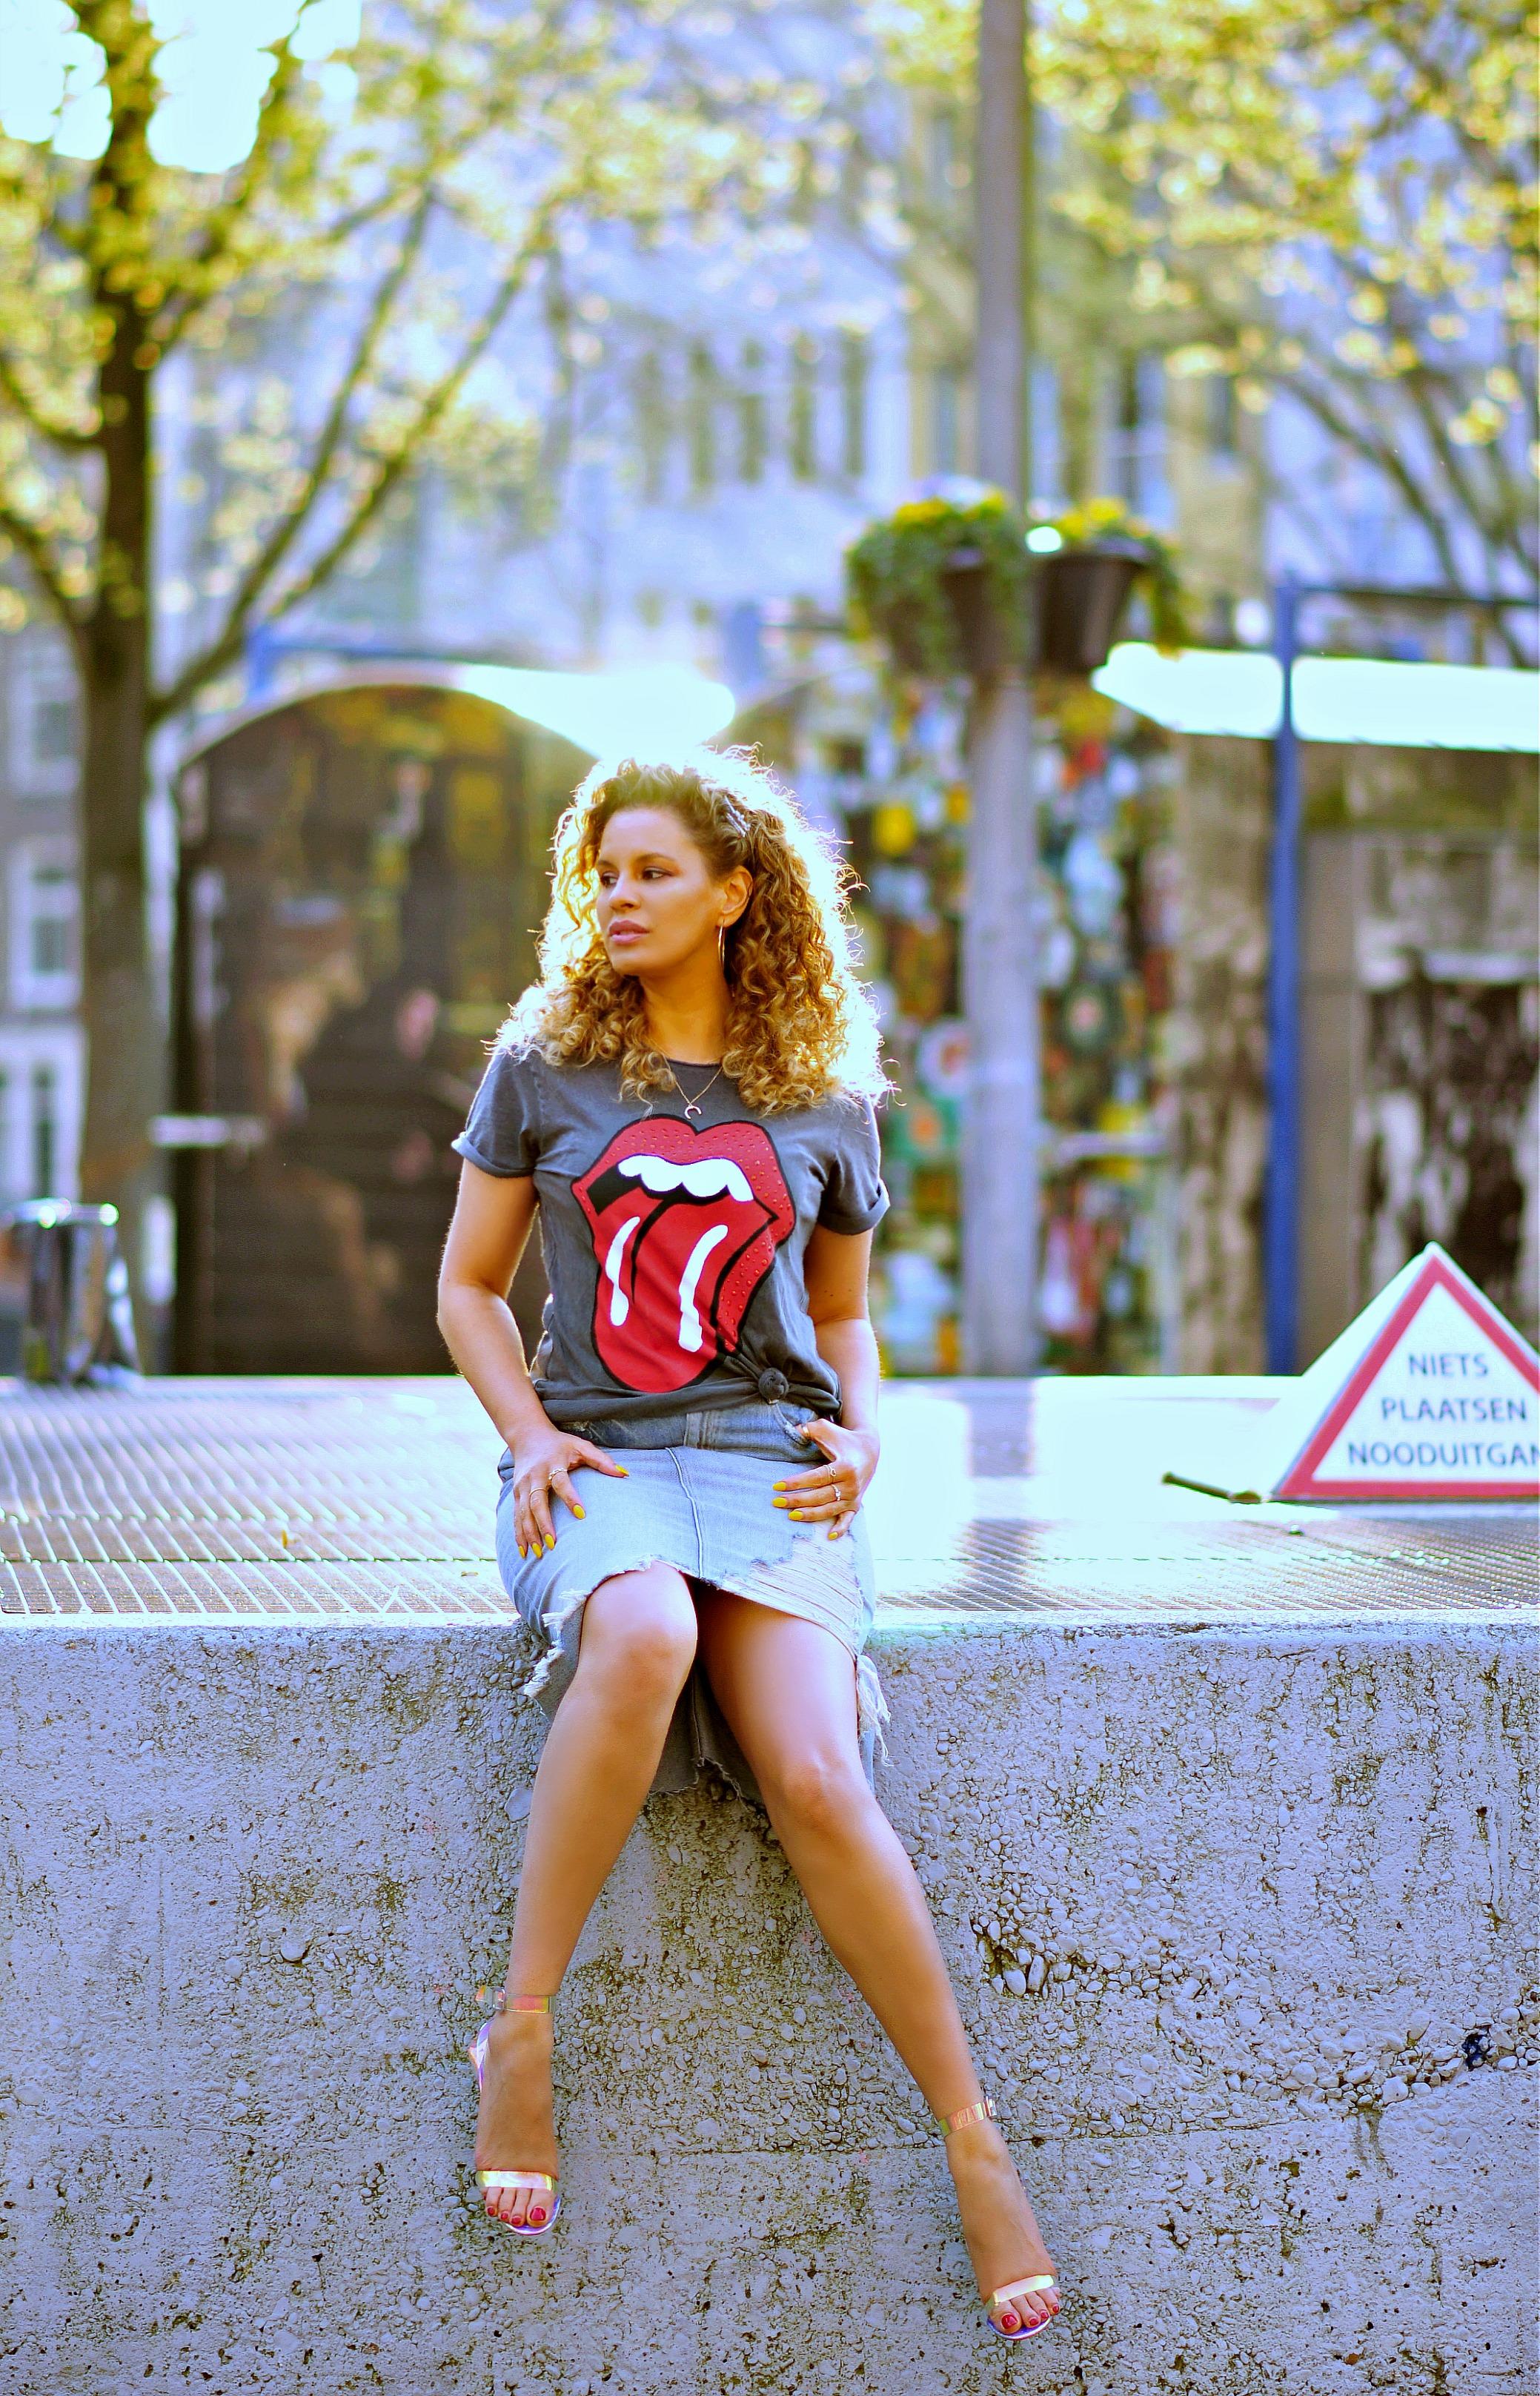 Rolling Stones Tee, tamara Chloé4+3